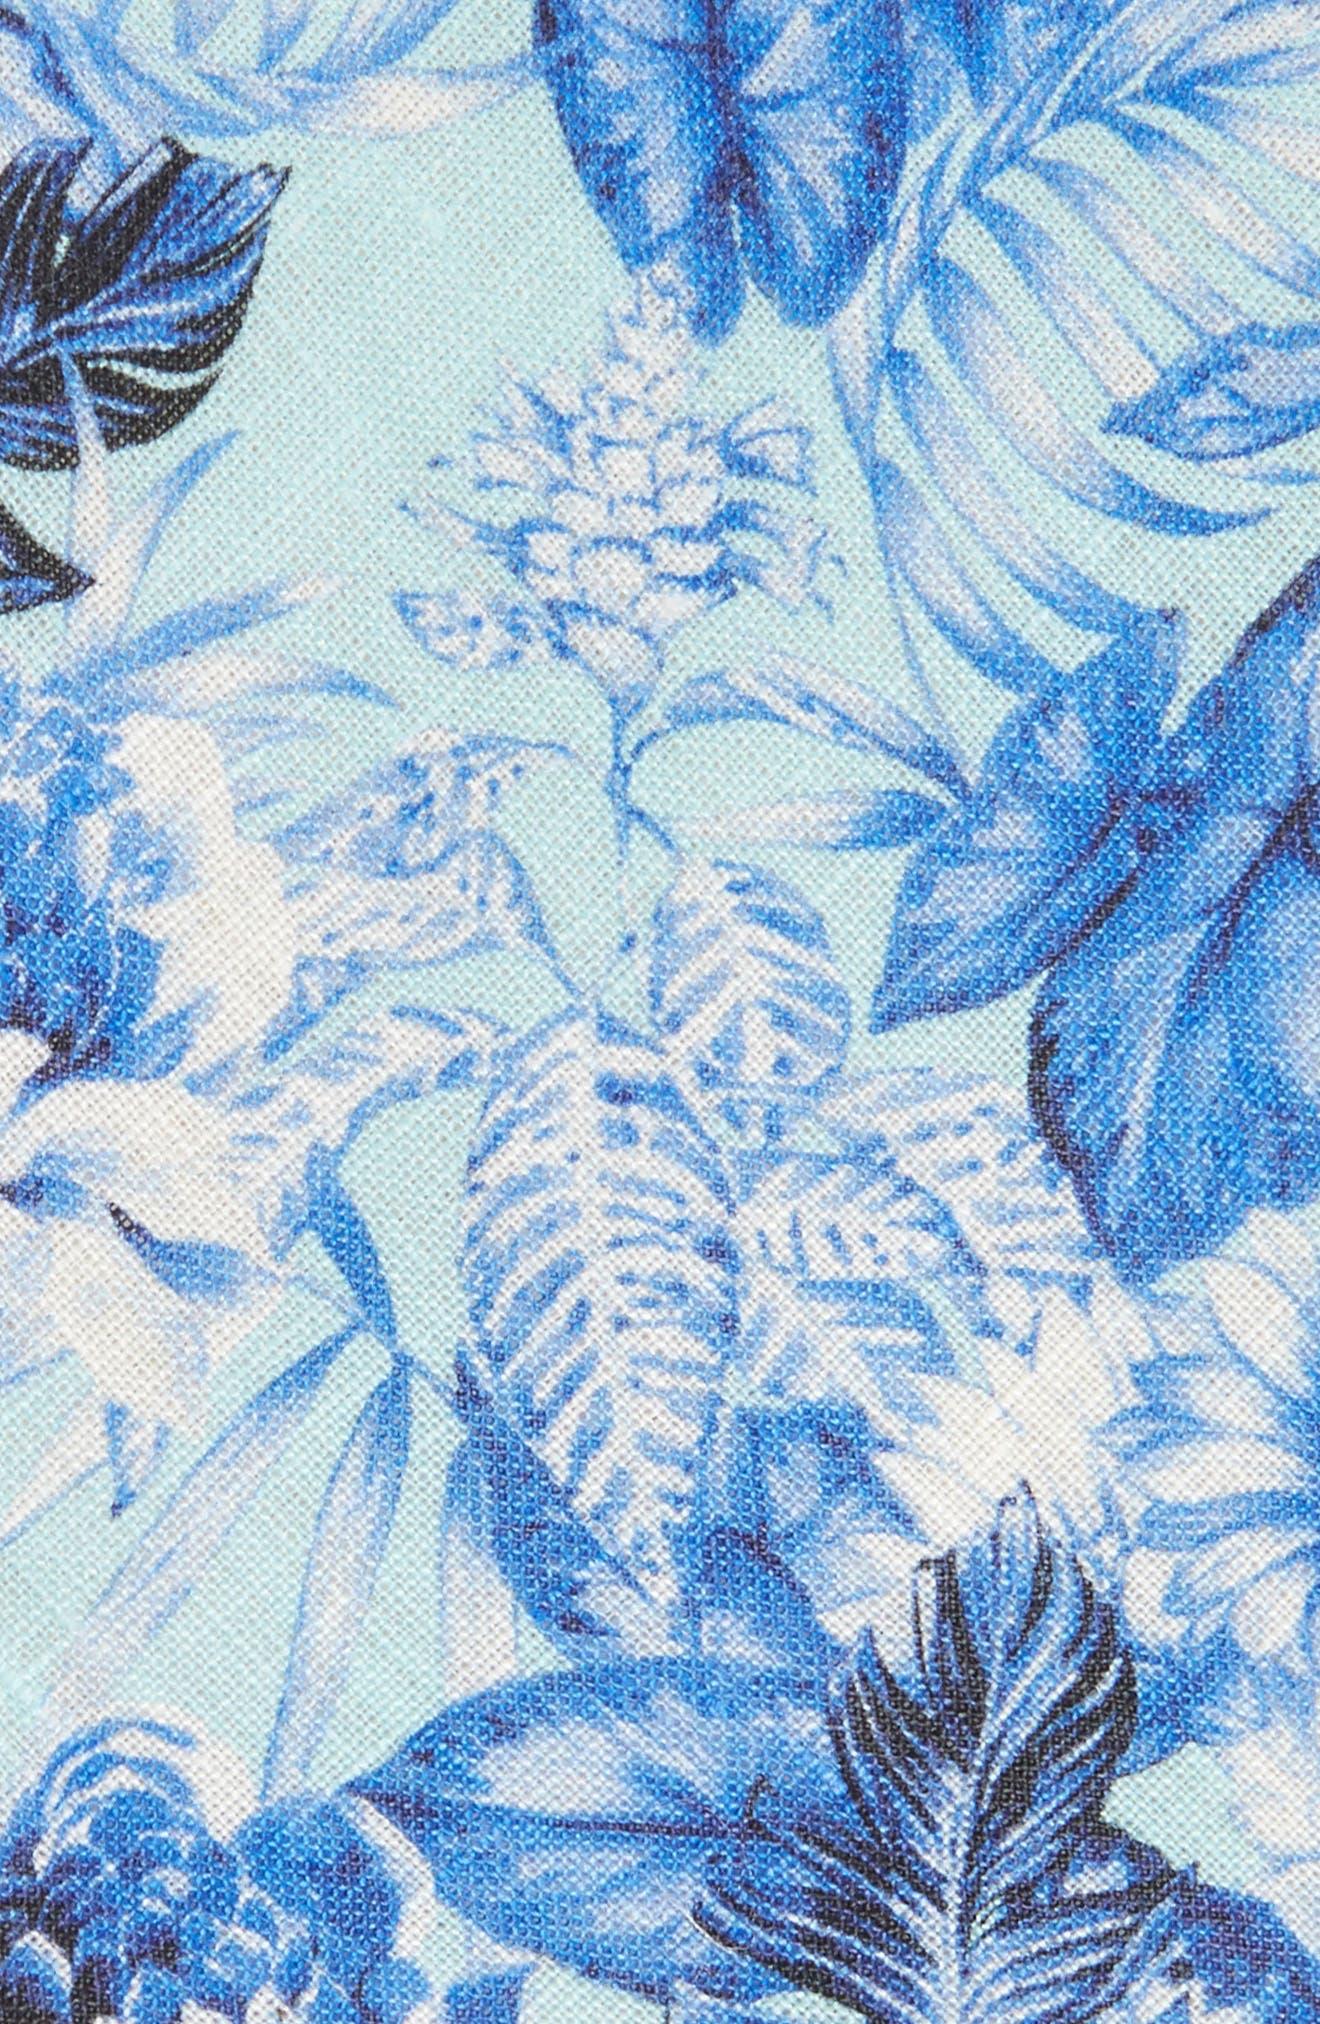 Tropic Fever Linen Tie,                             Alternate thumbnail 2, color,                             Island Paradise